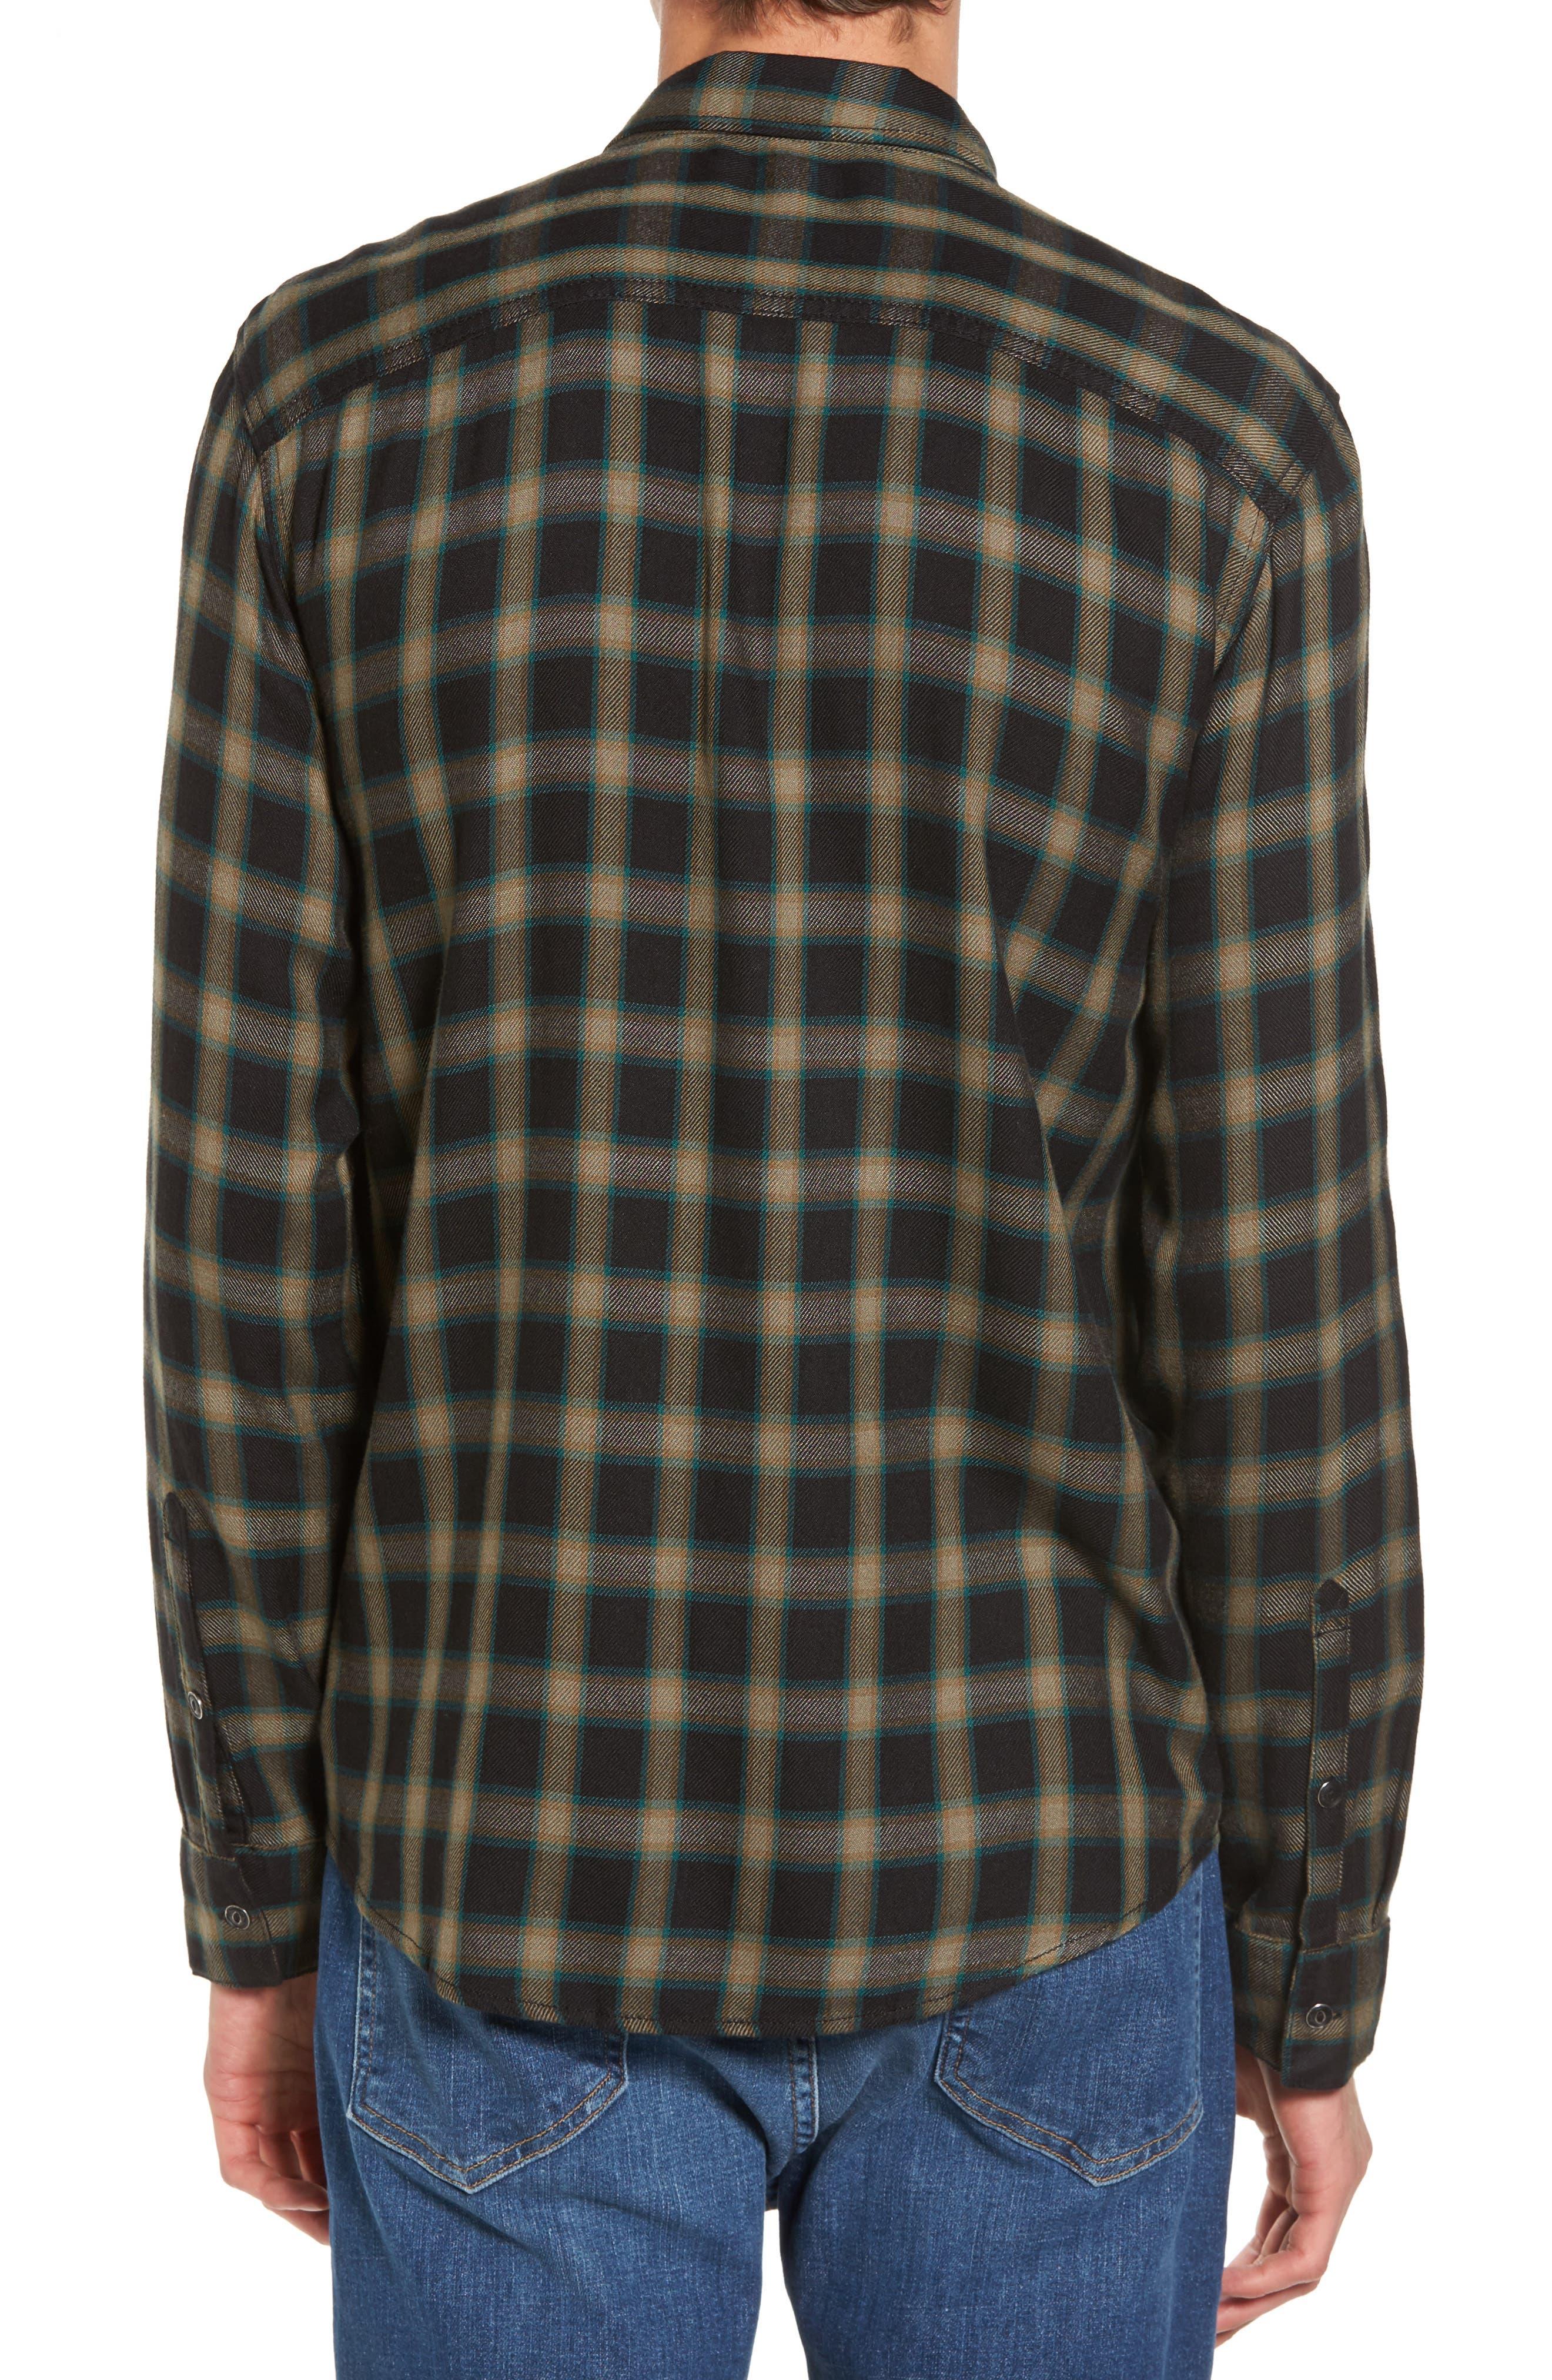 Virgil Plaid Sport Shirt,                             Alternate thumbnail 2, color,                             Black Rock Green Edocha Plaid